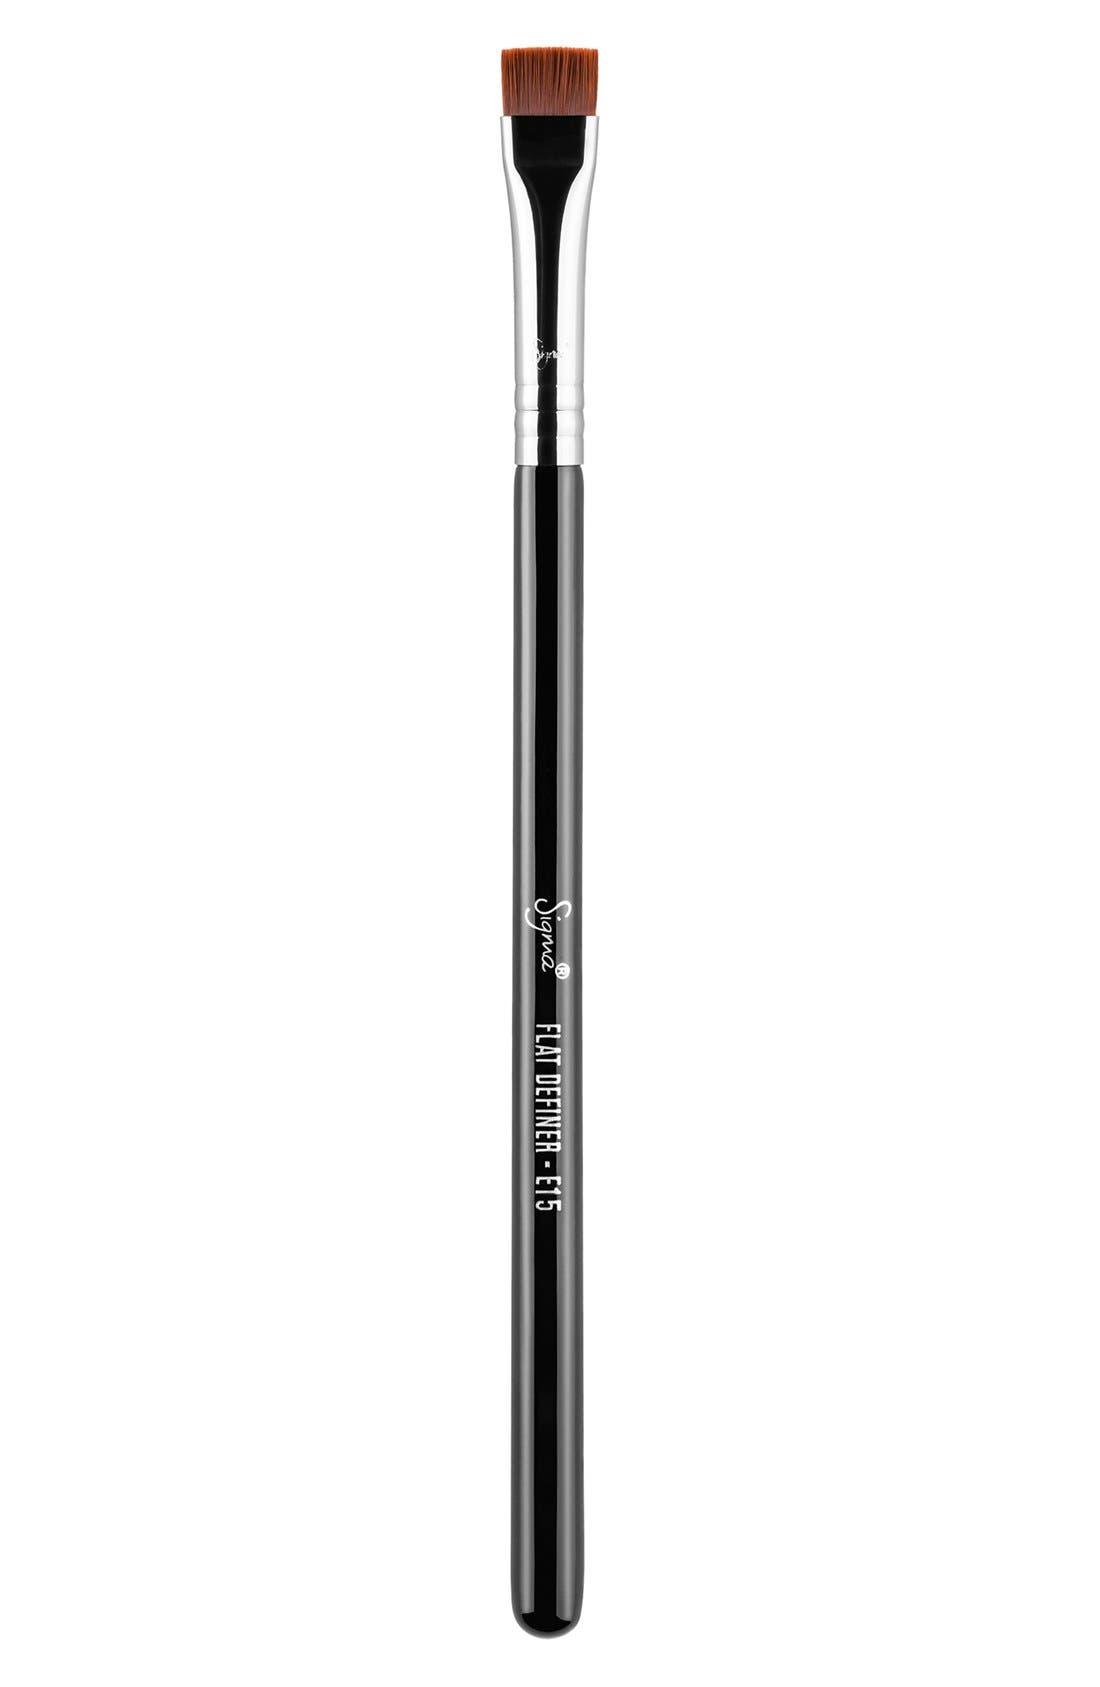 E15 Flat Definer Brush,                         Main,                         color, NO COLOR